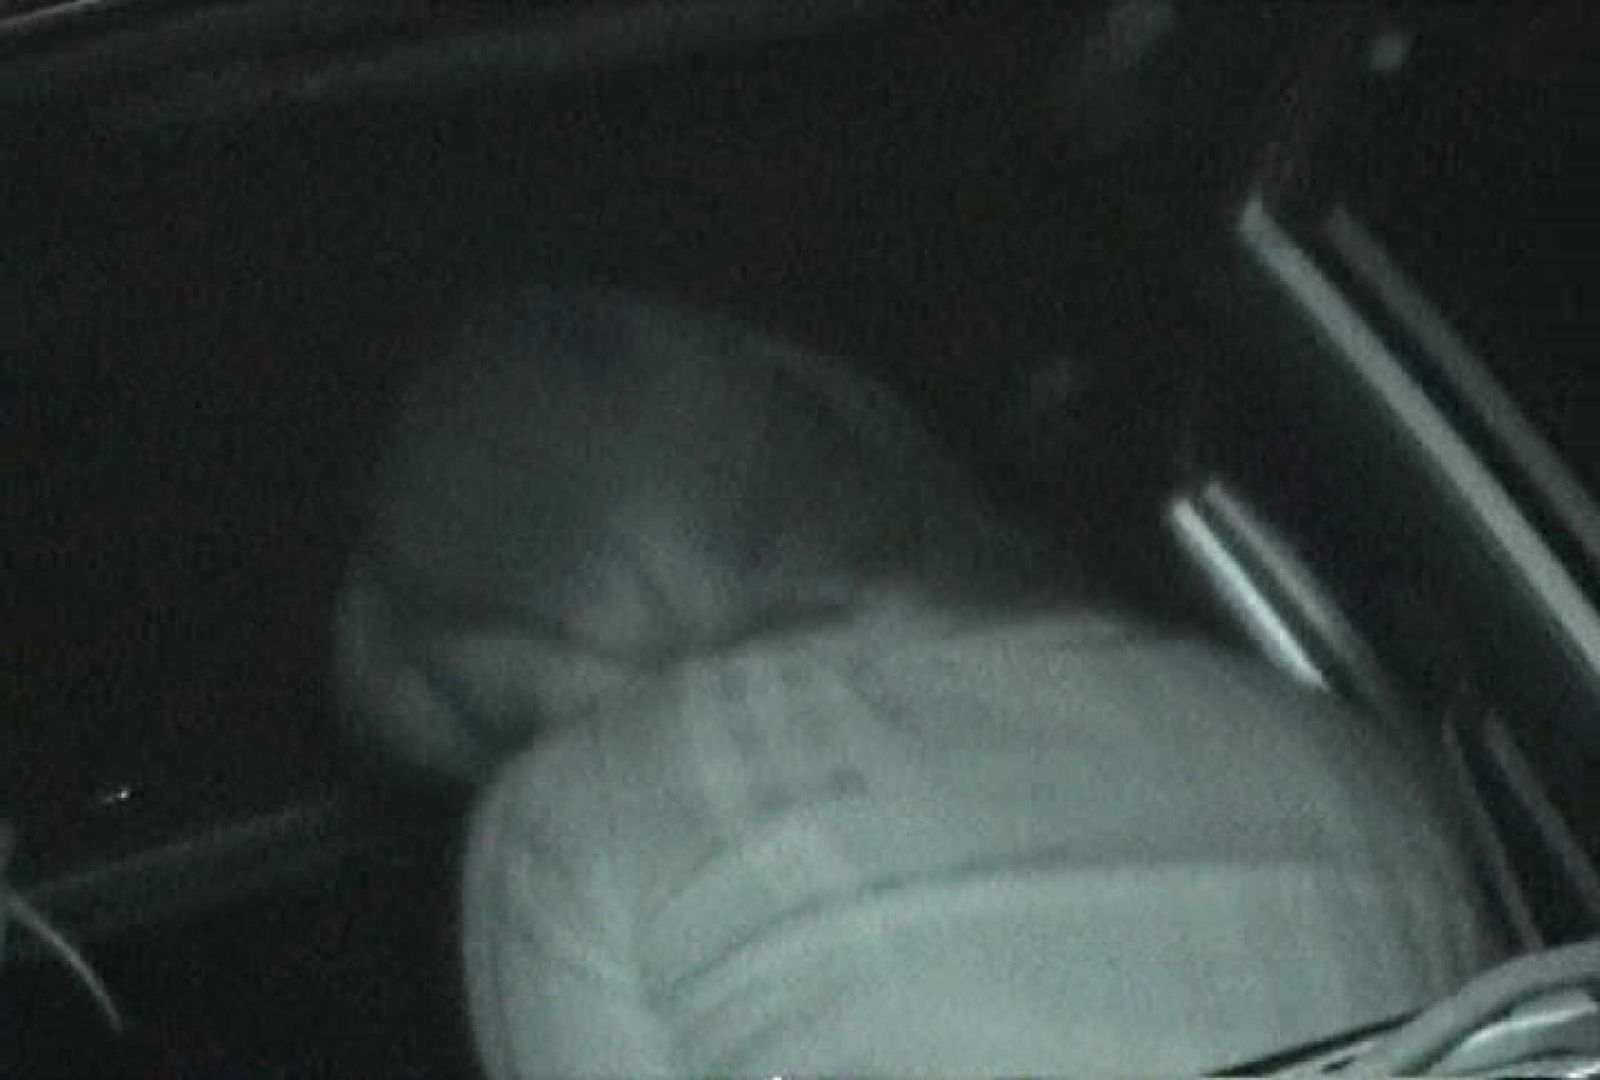 充血監督の深夜の運動会Vol.88 細身 戯れ無修正画像 73画像 69